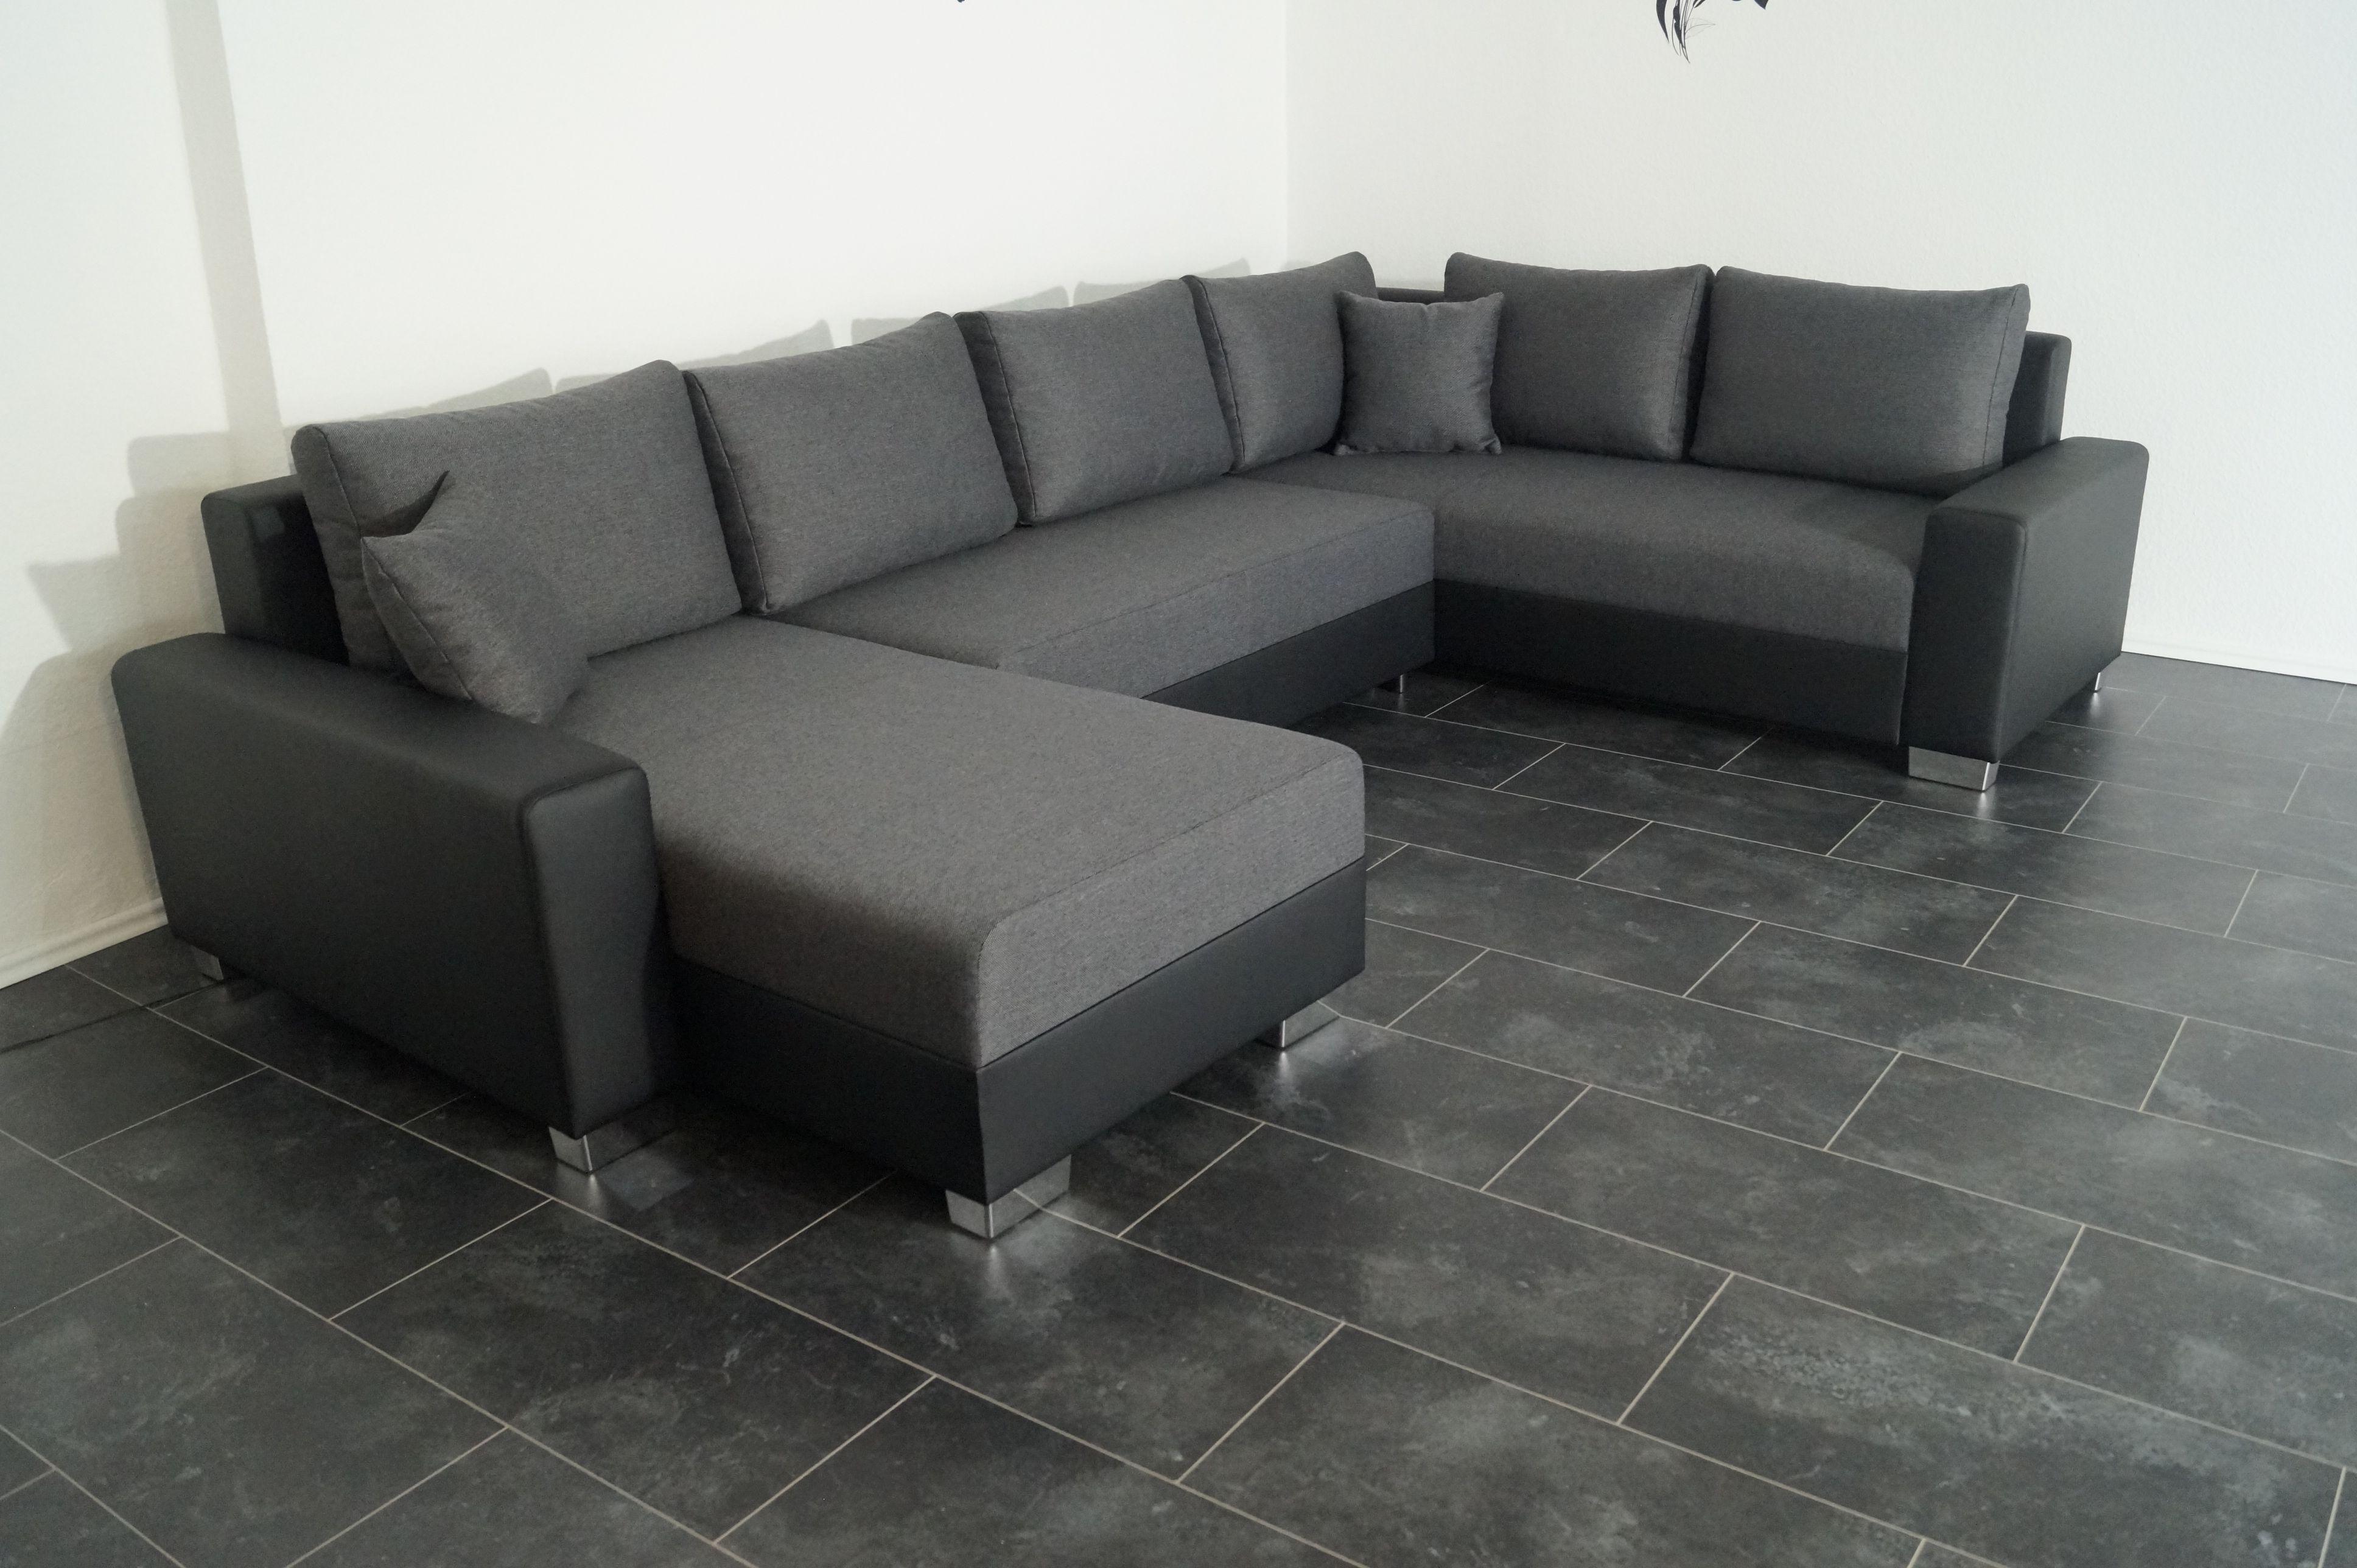 Sofa Lagerverkauf Fabrikverkauf Elkenroth Polstermobel Wohnlandschaften Trendsofas Sofas Sofort Ab Lager Www Sofa Fabrikver Sofa Design Couch Sectional Couch